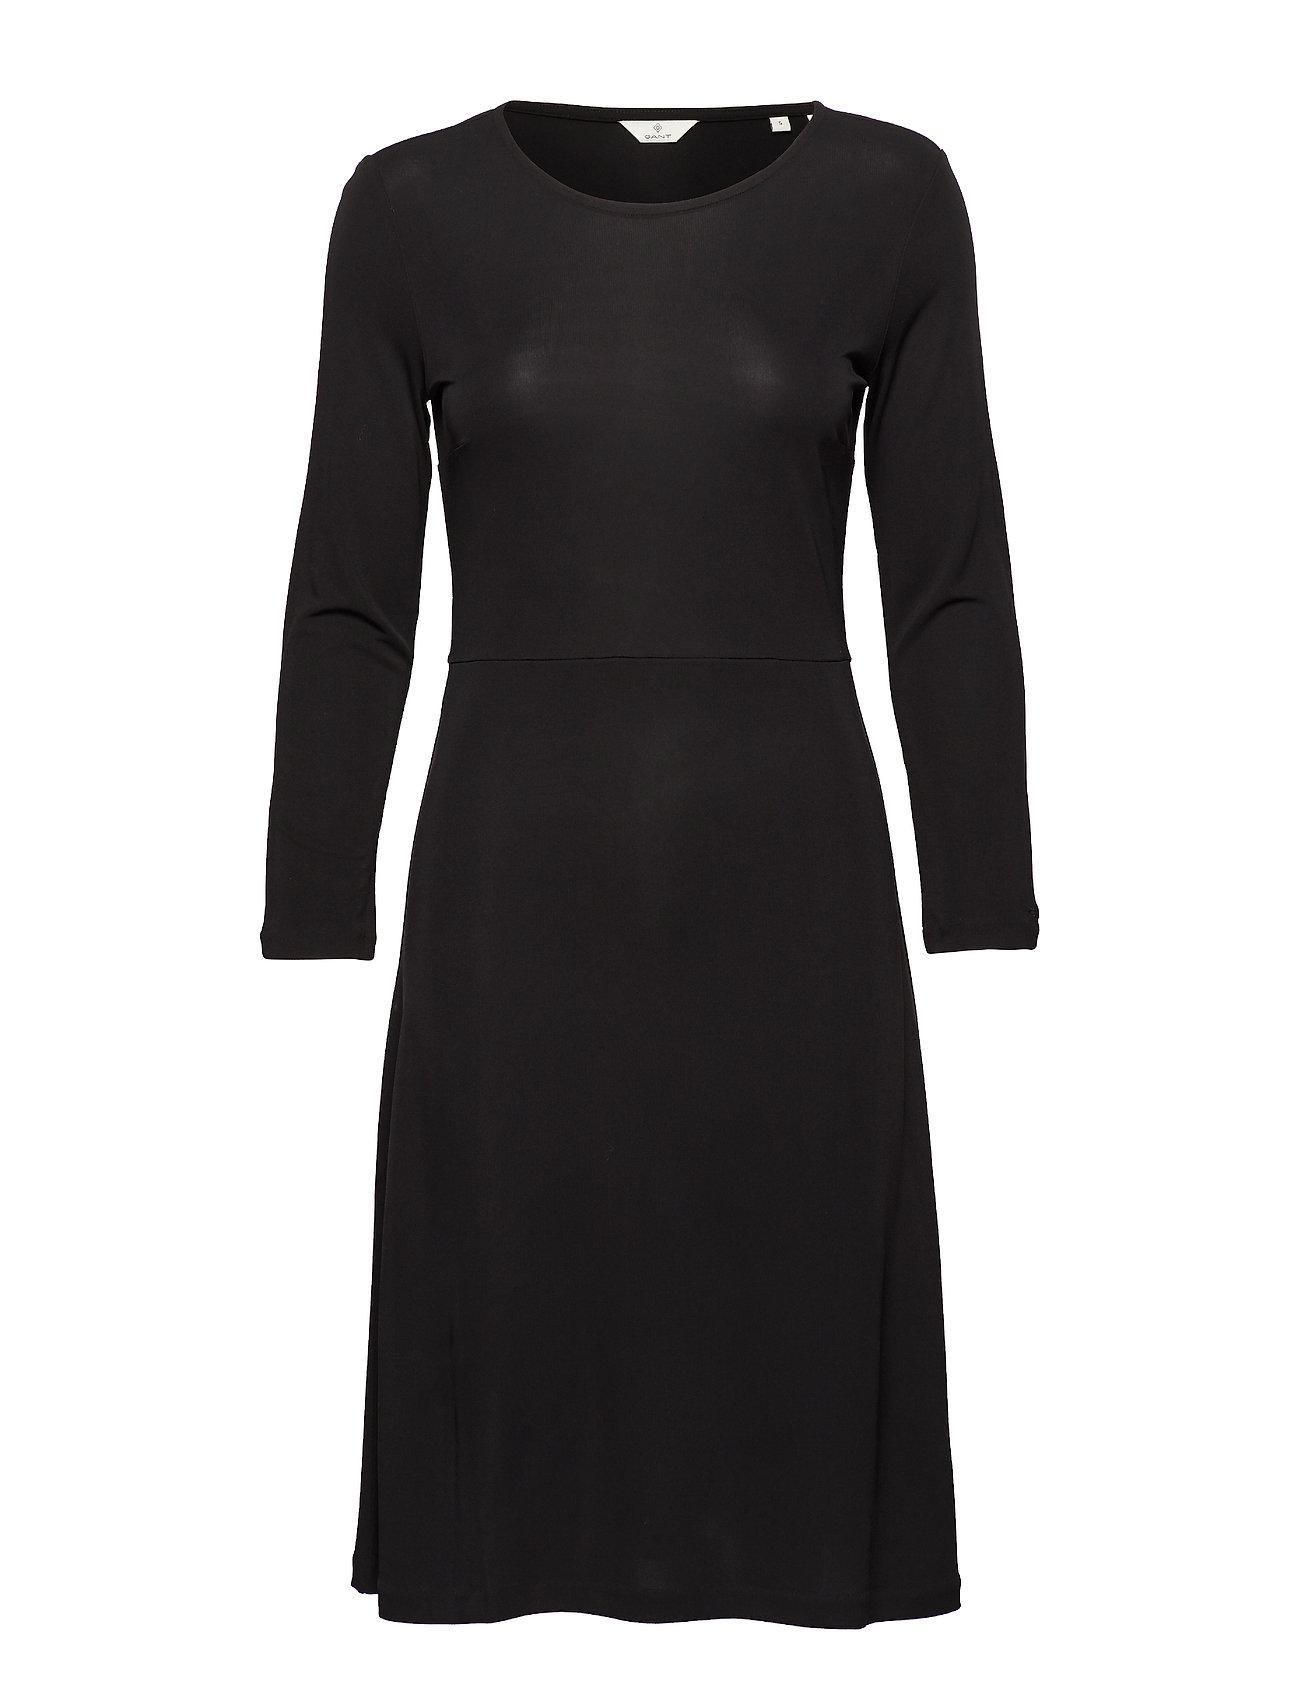 GANT G1. SOPHISTICATED DRESS - BLACK